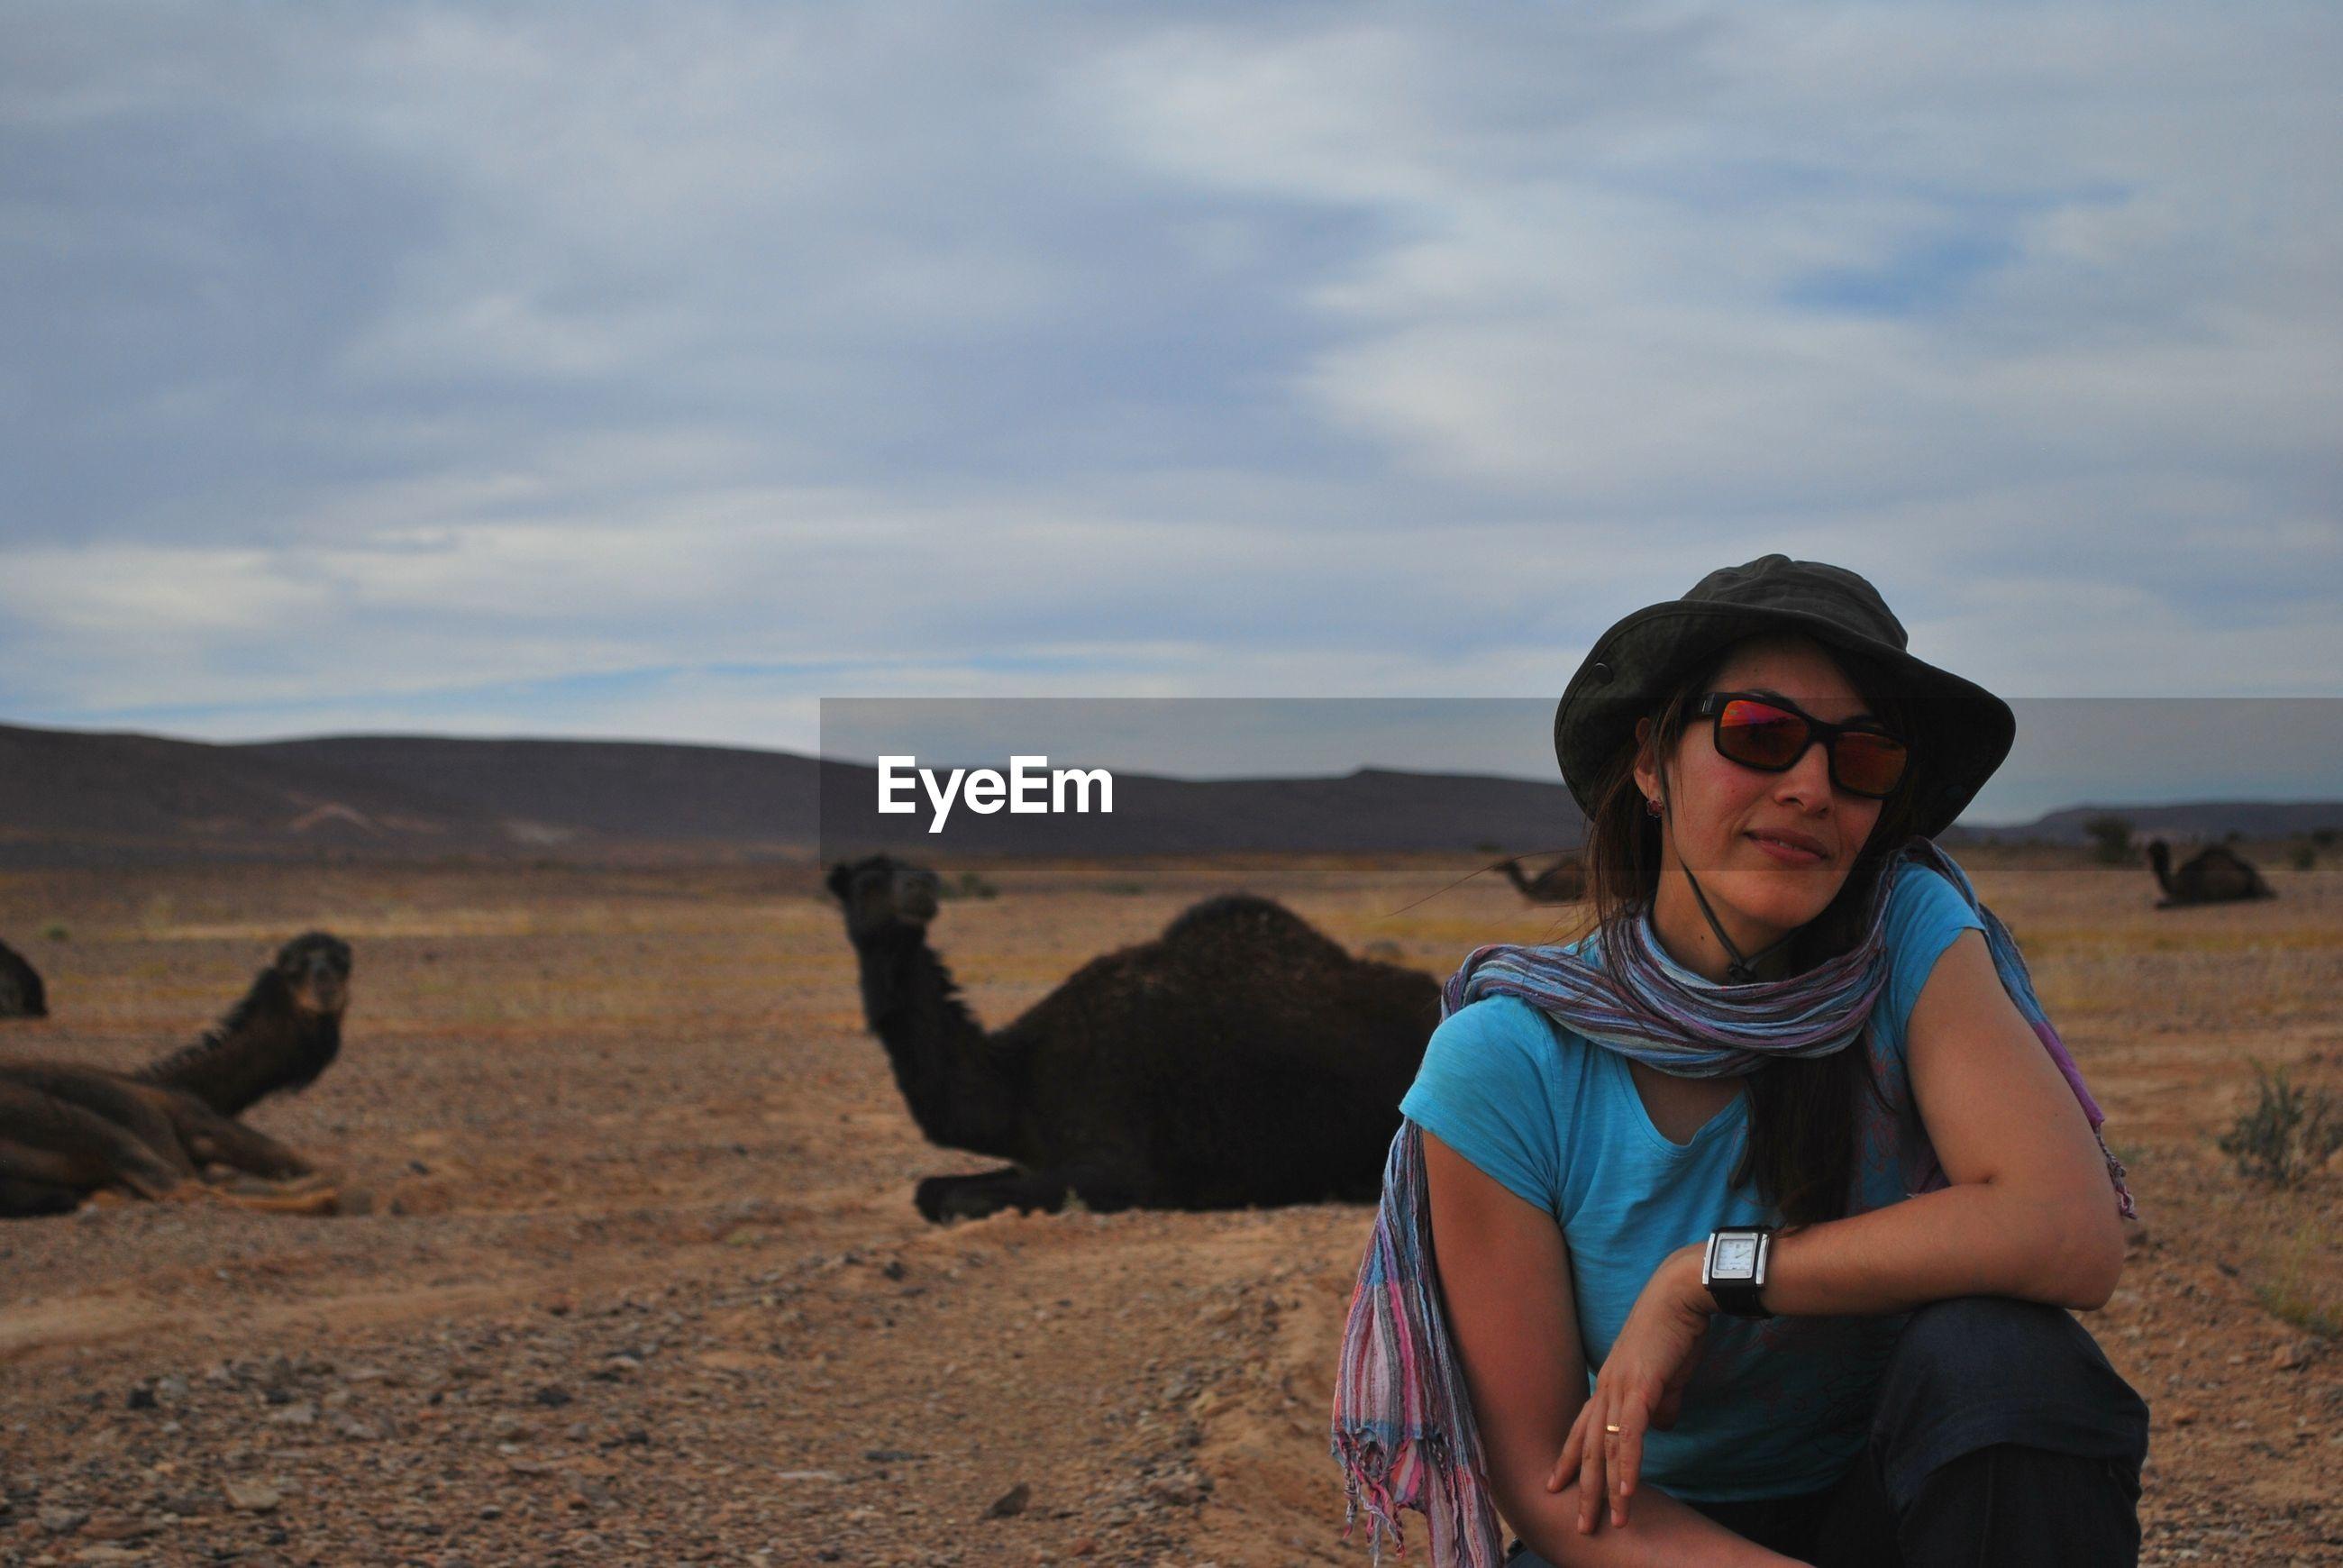 Portrait of woman in desert against sky